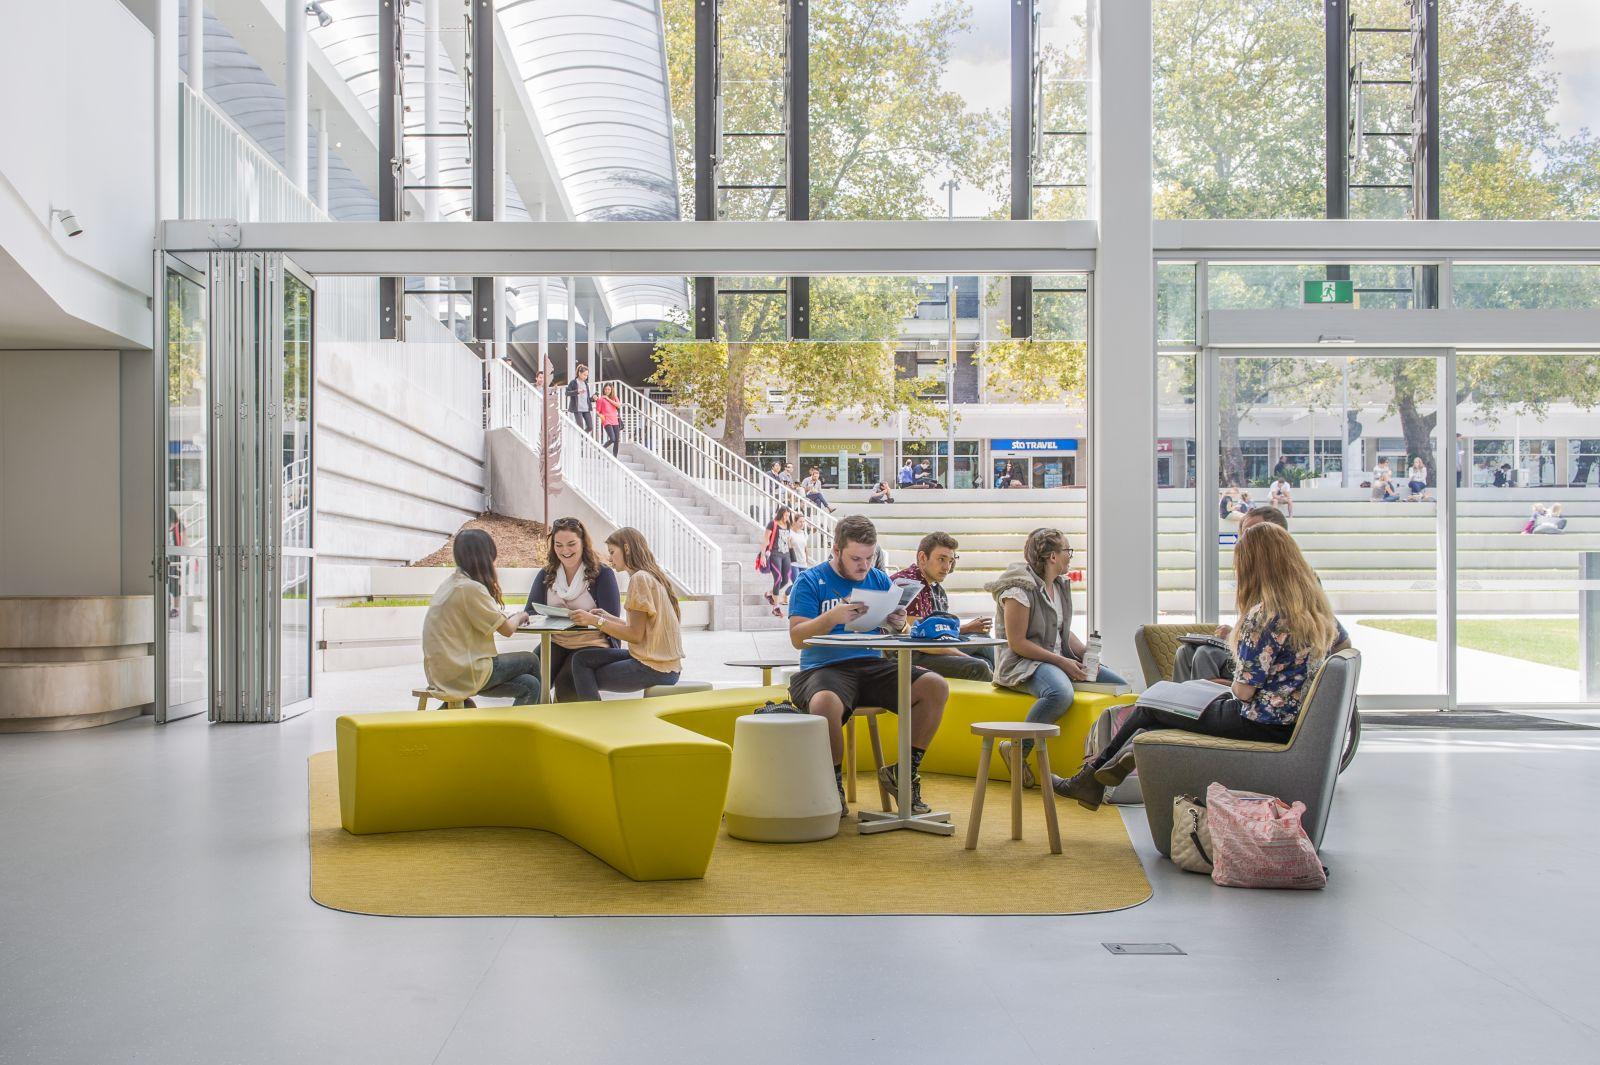 Students sitting in daylit atrium at Flinders University